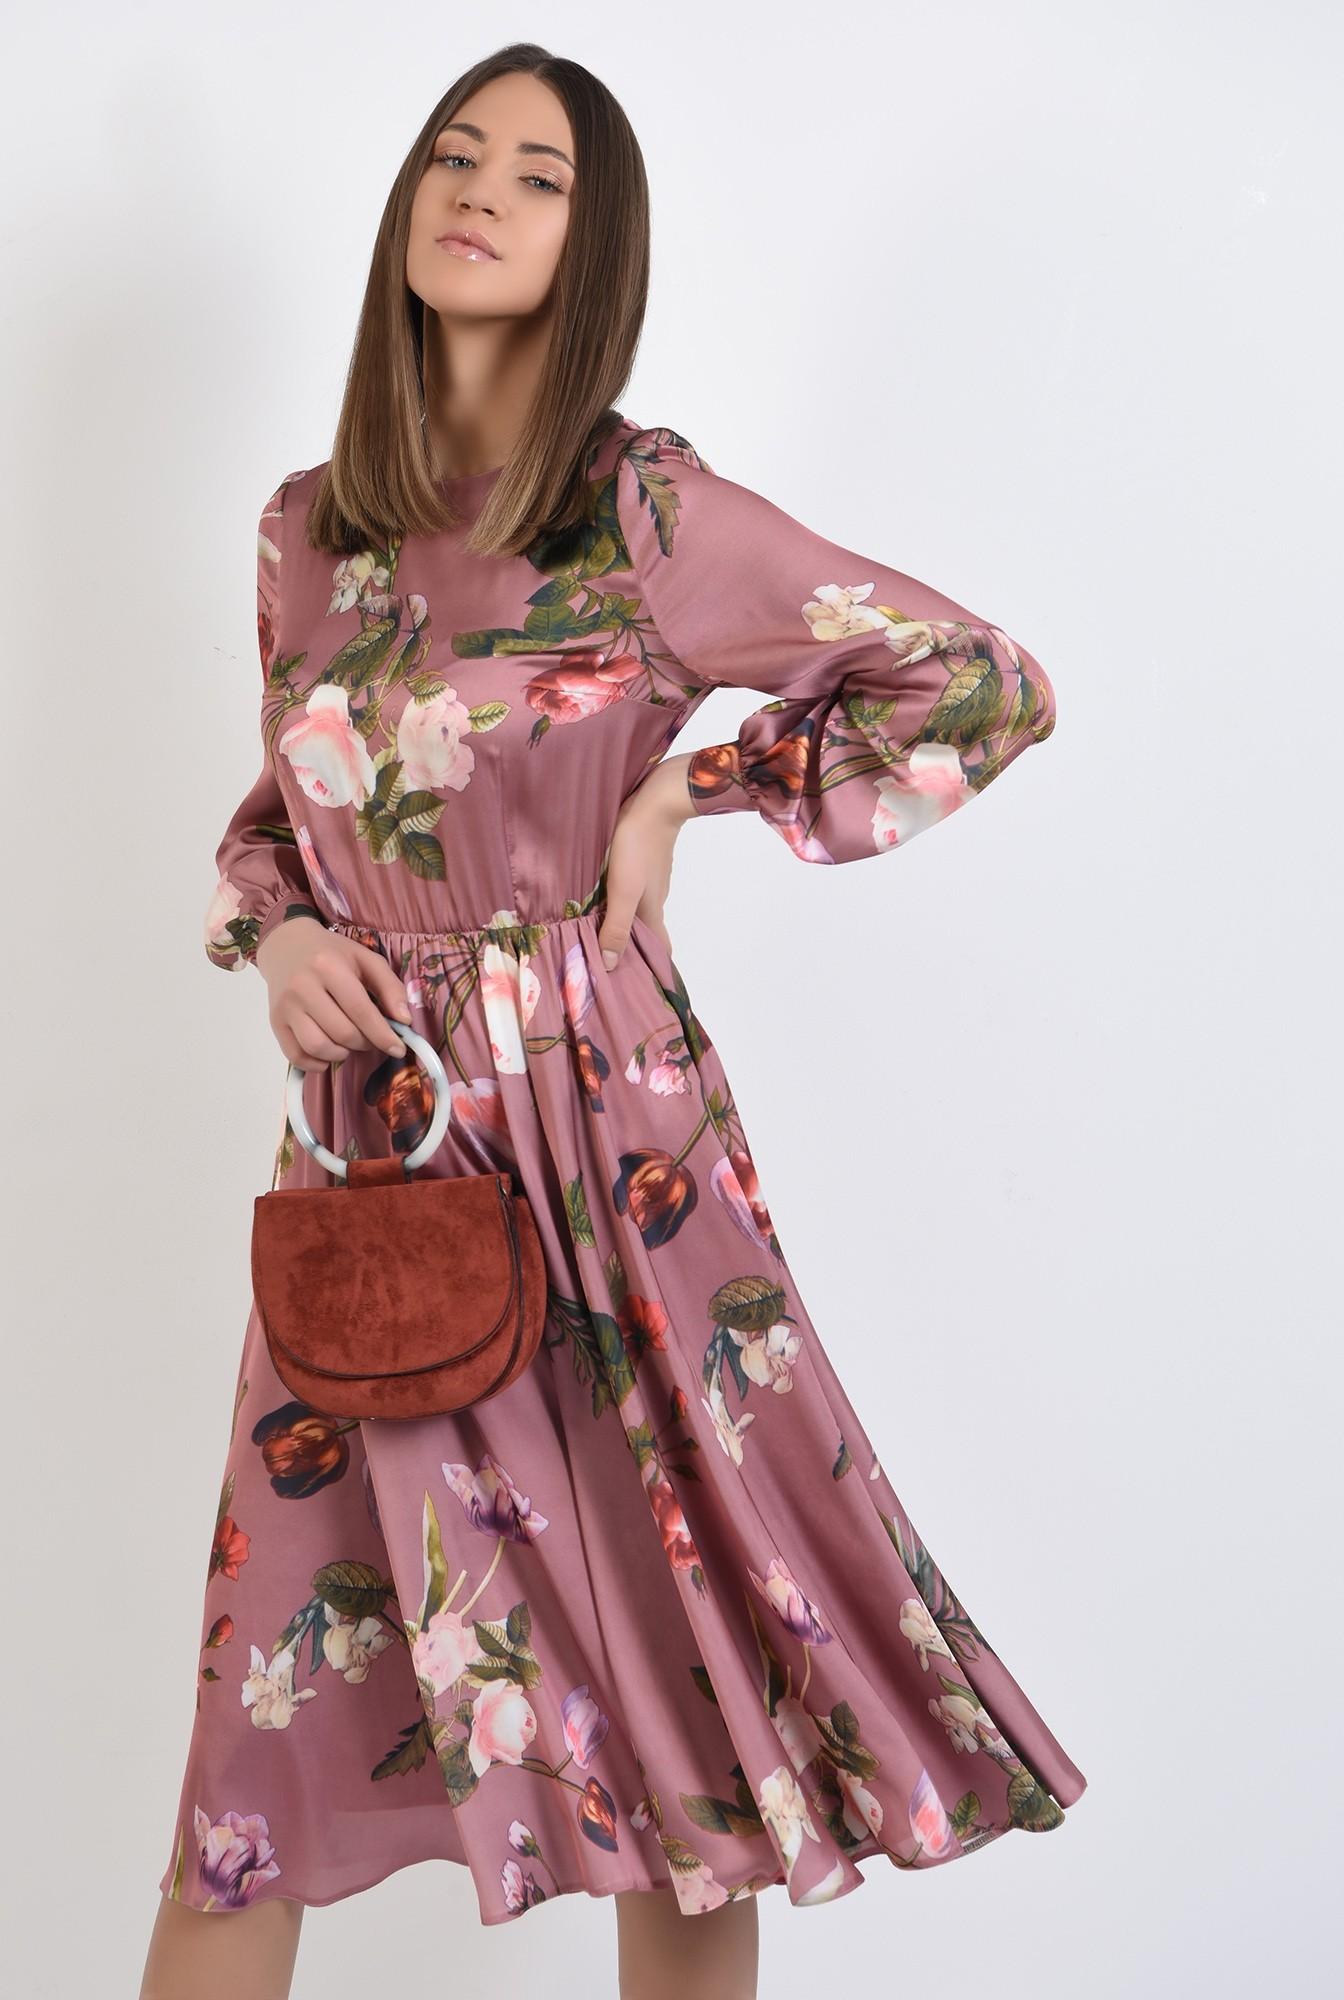 0 - 360 - rochie de primavara, clos, cu imprimeu floral, evazata, maneci lungi bufante